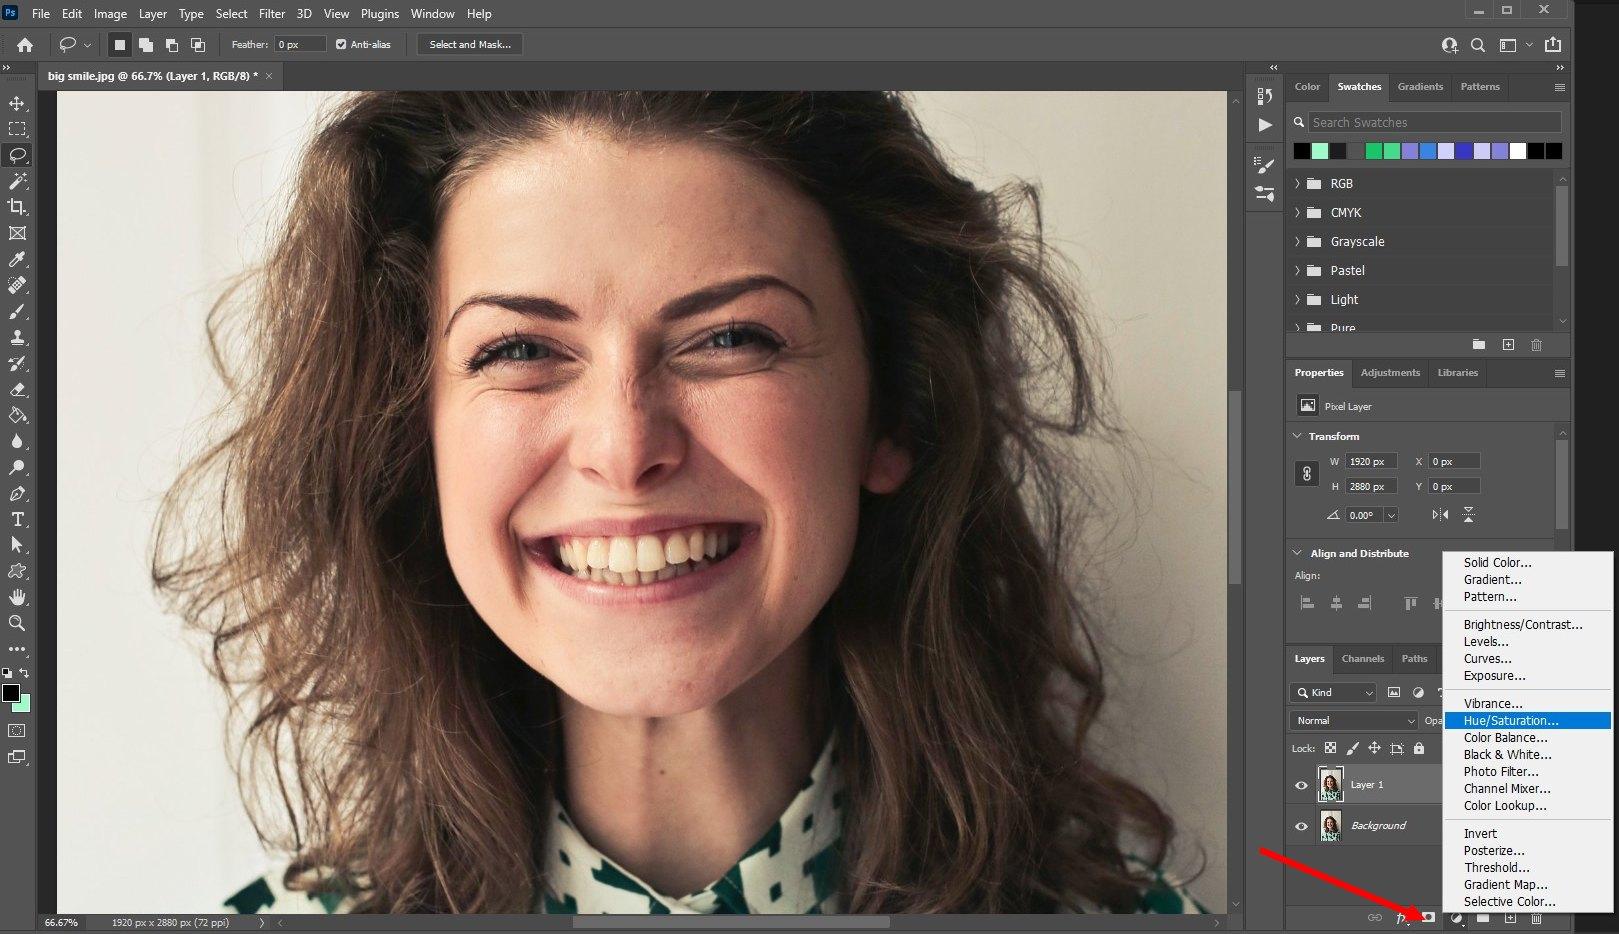 how to whiten teeth photoshop - 3